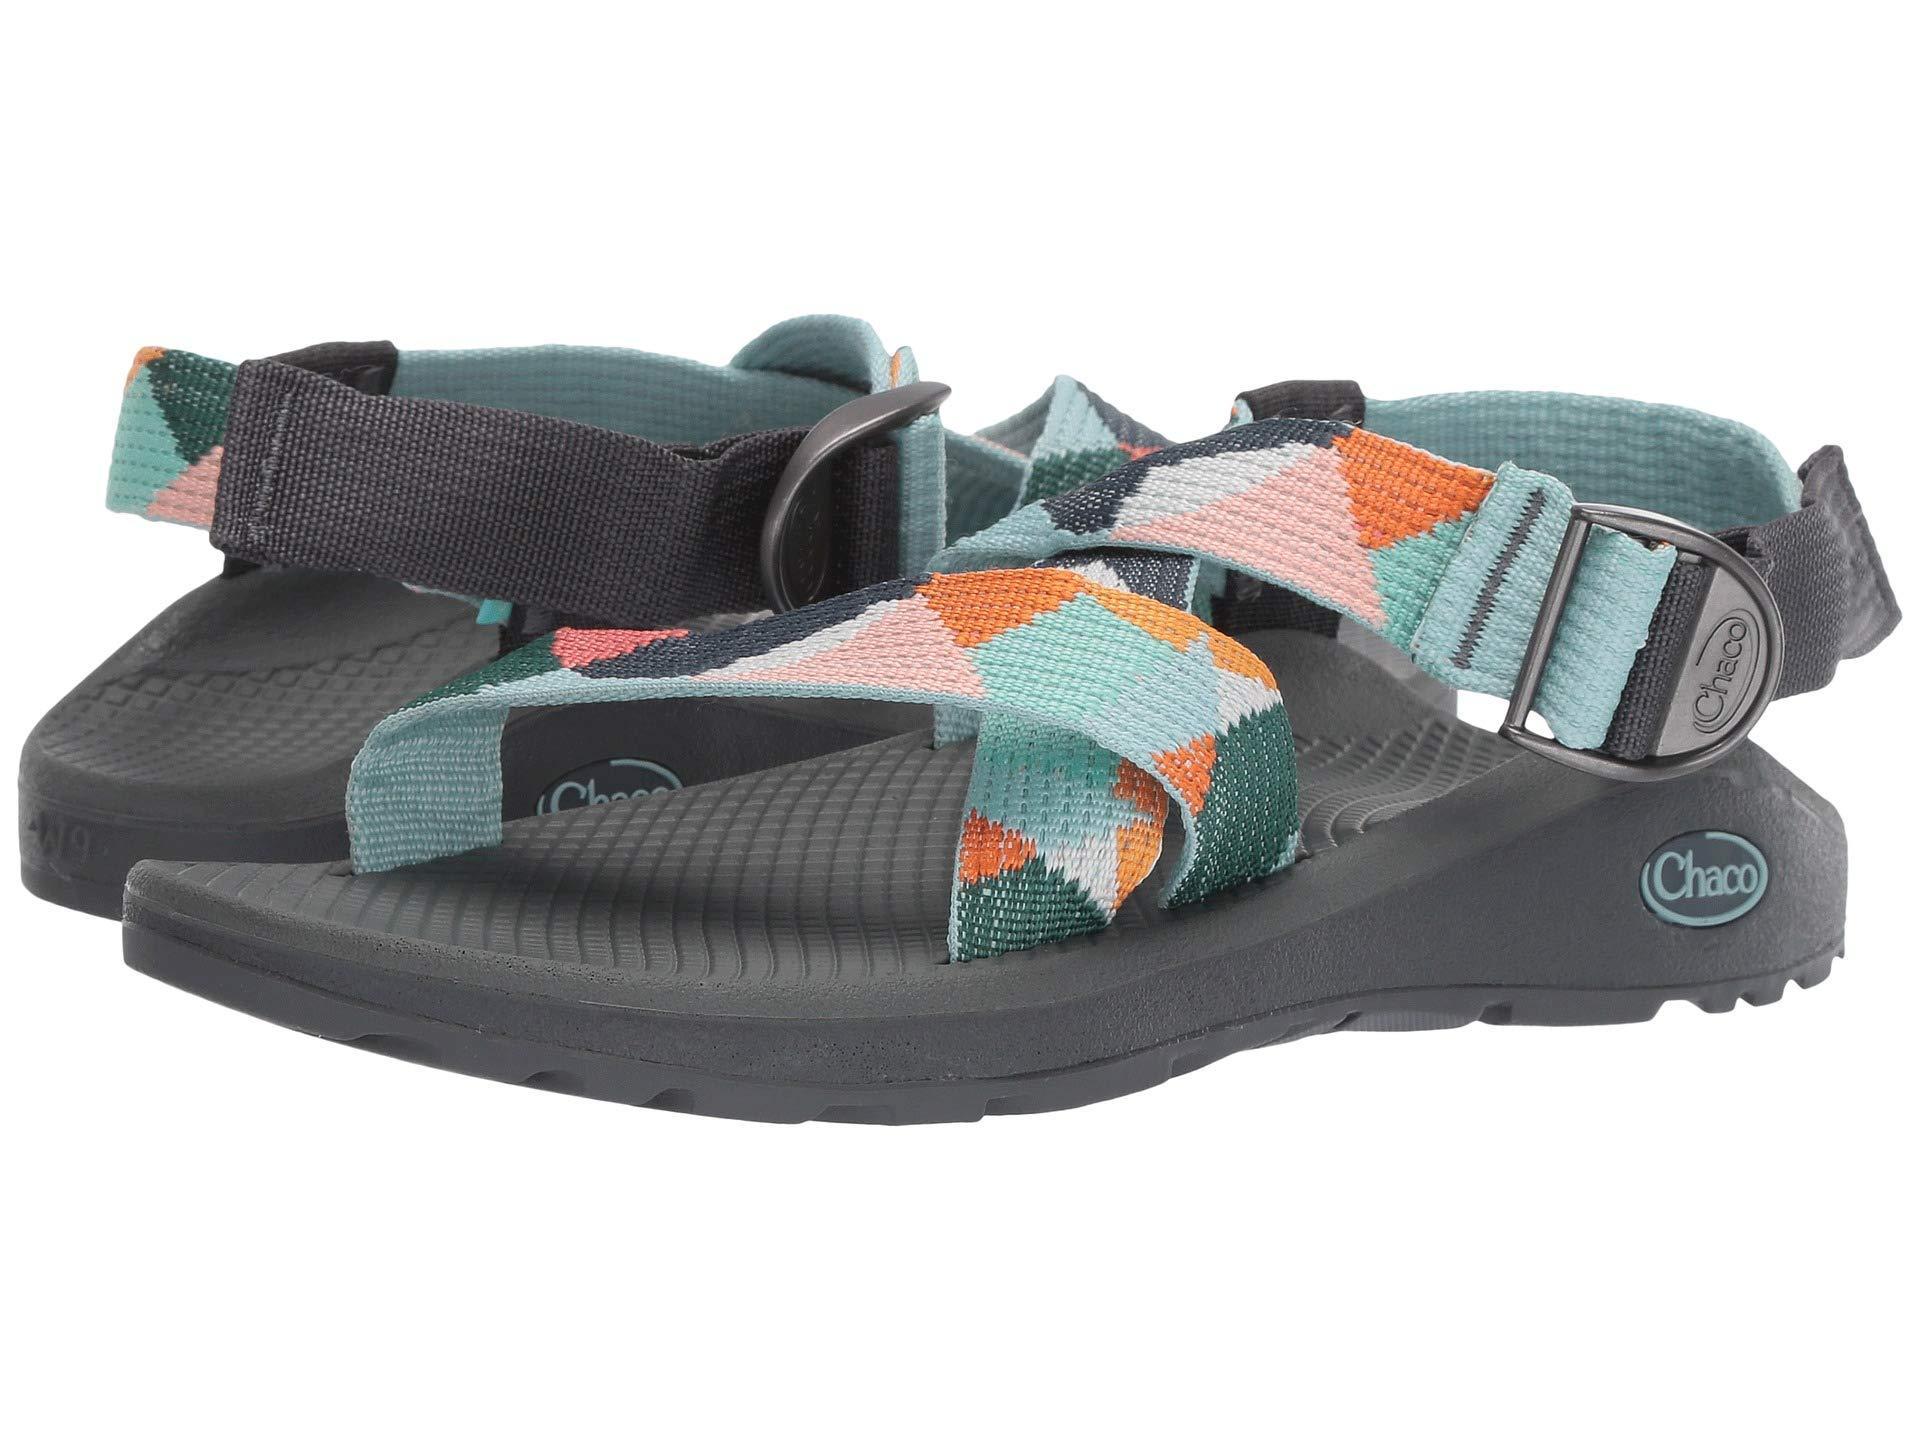 7f3d71465756 Chaco - Multicolor Mega Z Cloud (blend Grenadine) Women s Sandals - Lyst.  View fullscreen